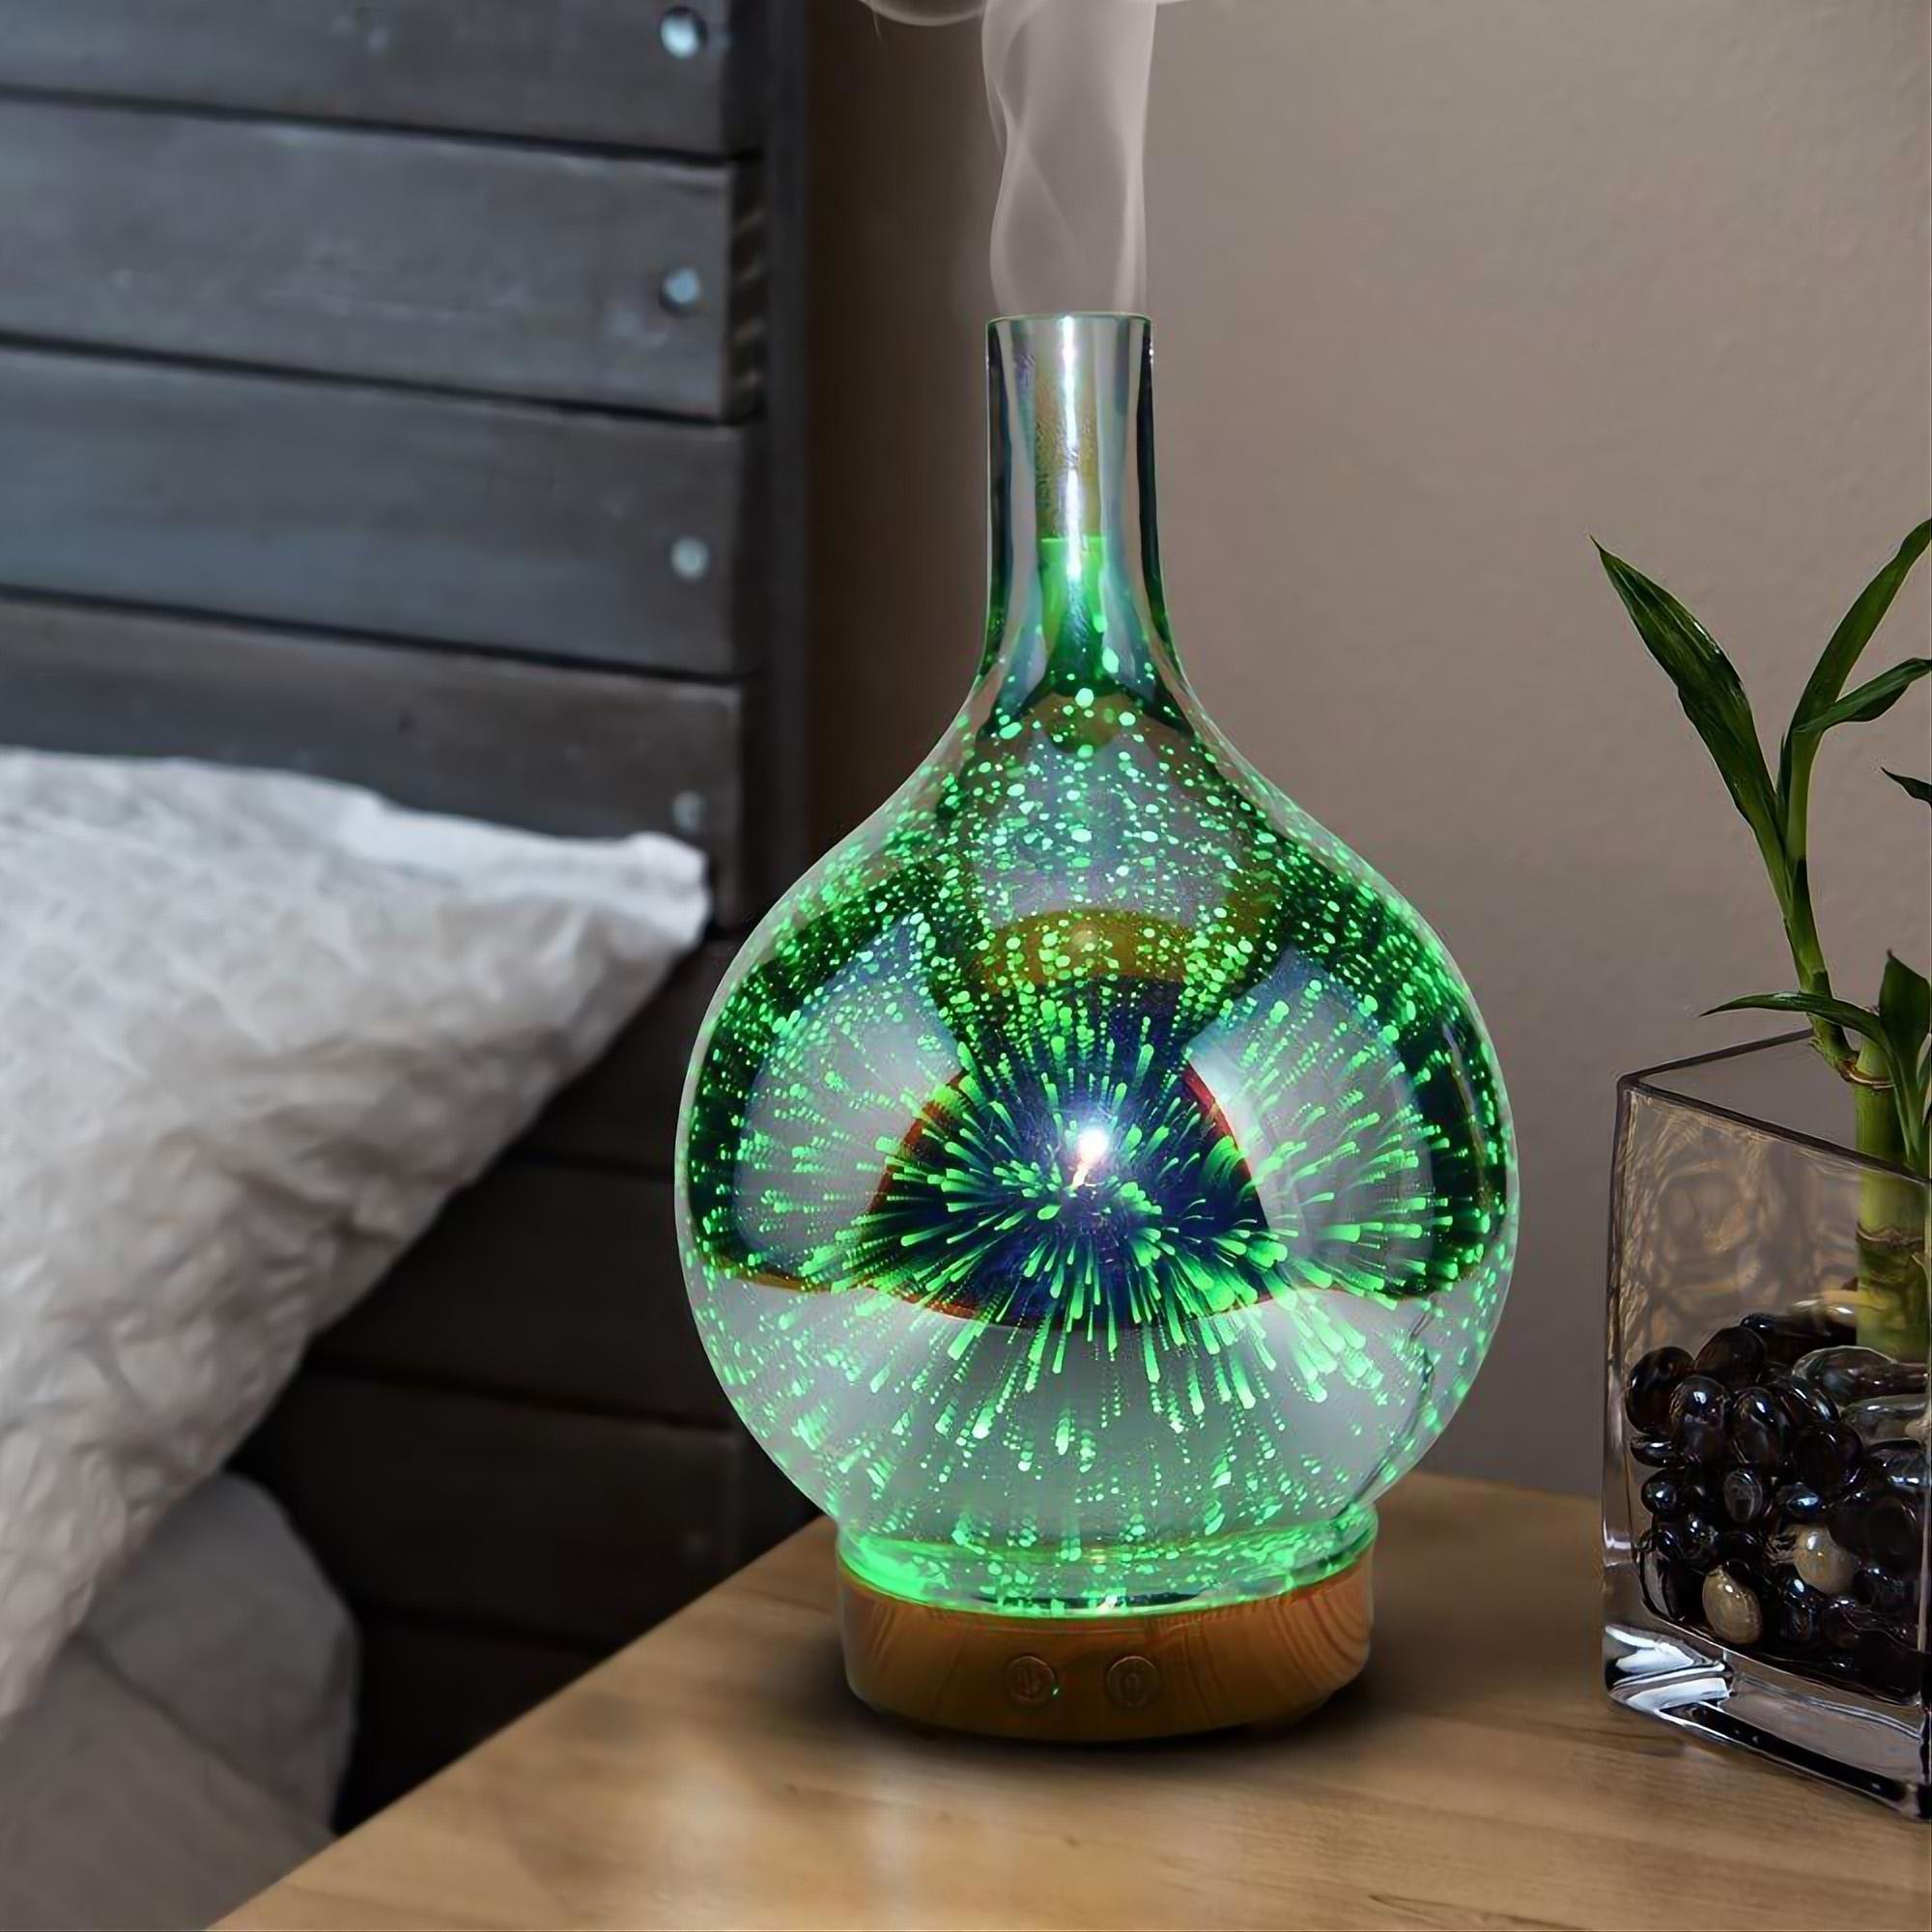 upscaler-inspire-uplift-stardust-oil-diffuser-light-wood-stardust-oil-diffuser-13872694558819_1024x1024@2x-2x.jpg